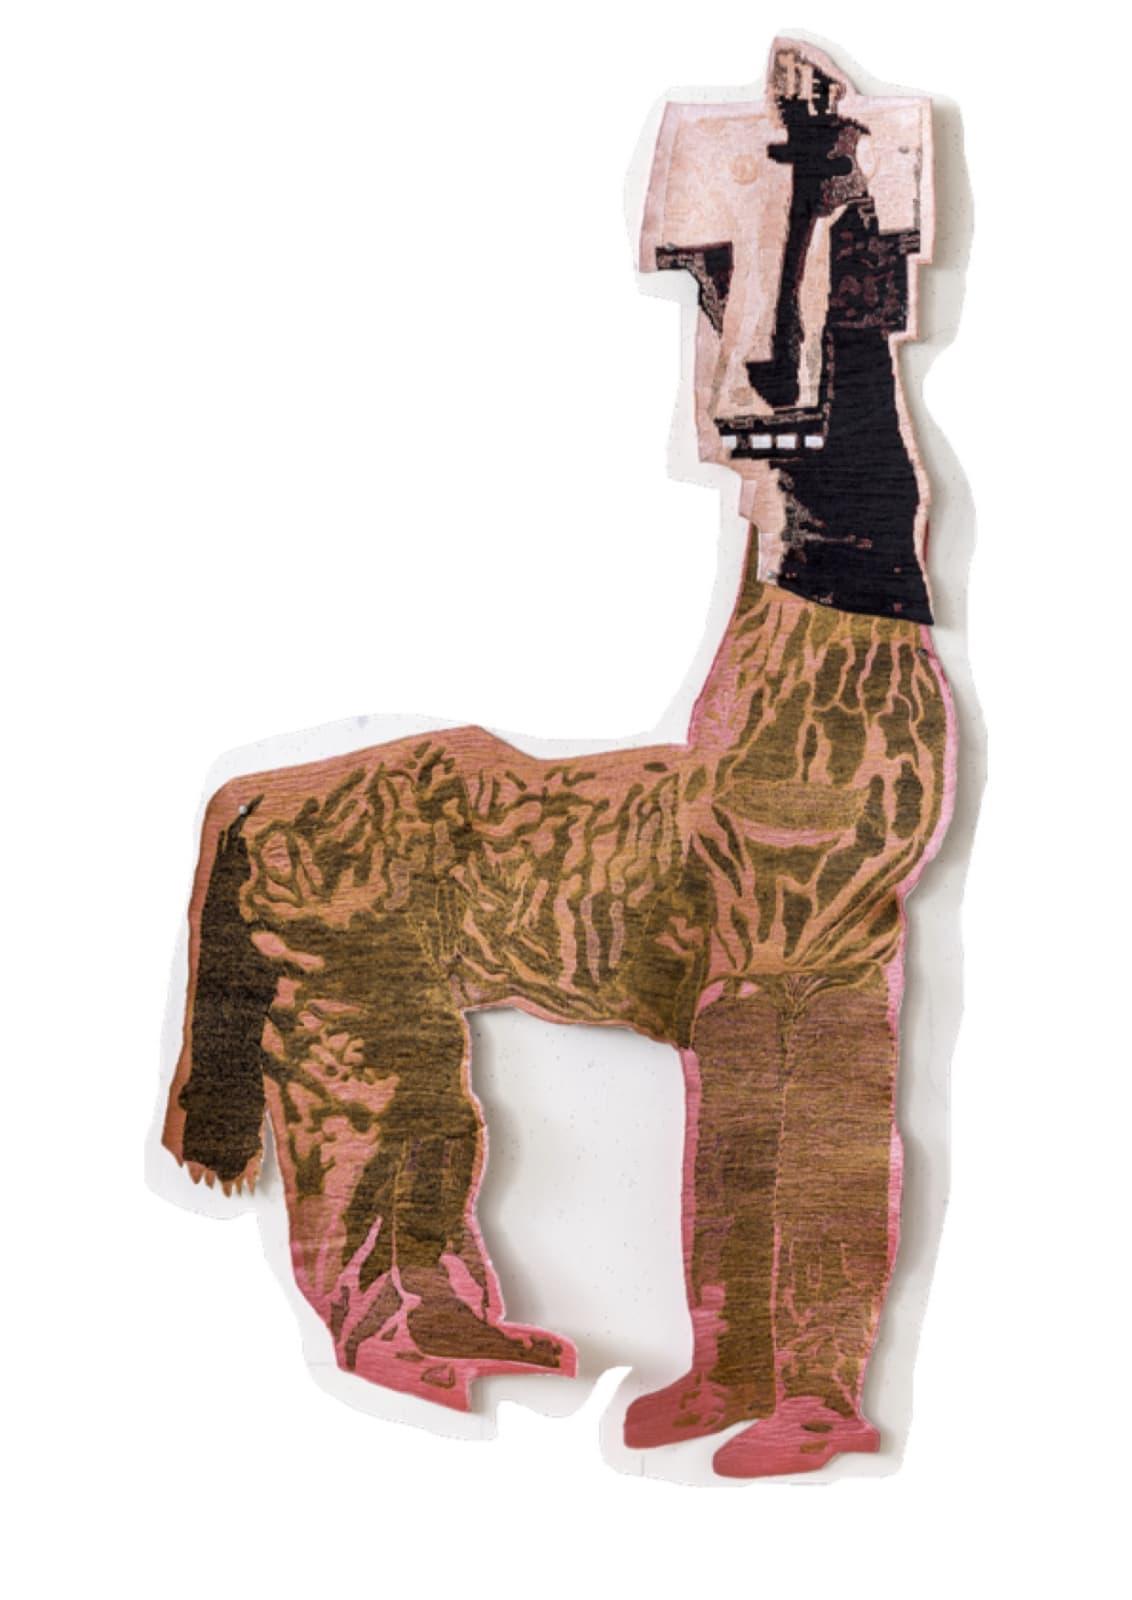 Sally Smart, HorseCraft (Orange), 2015